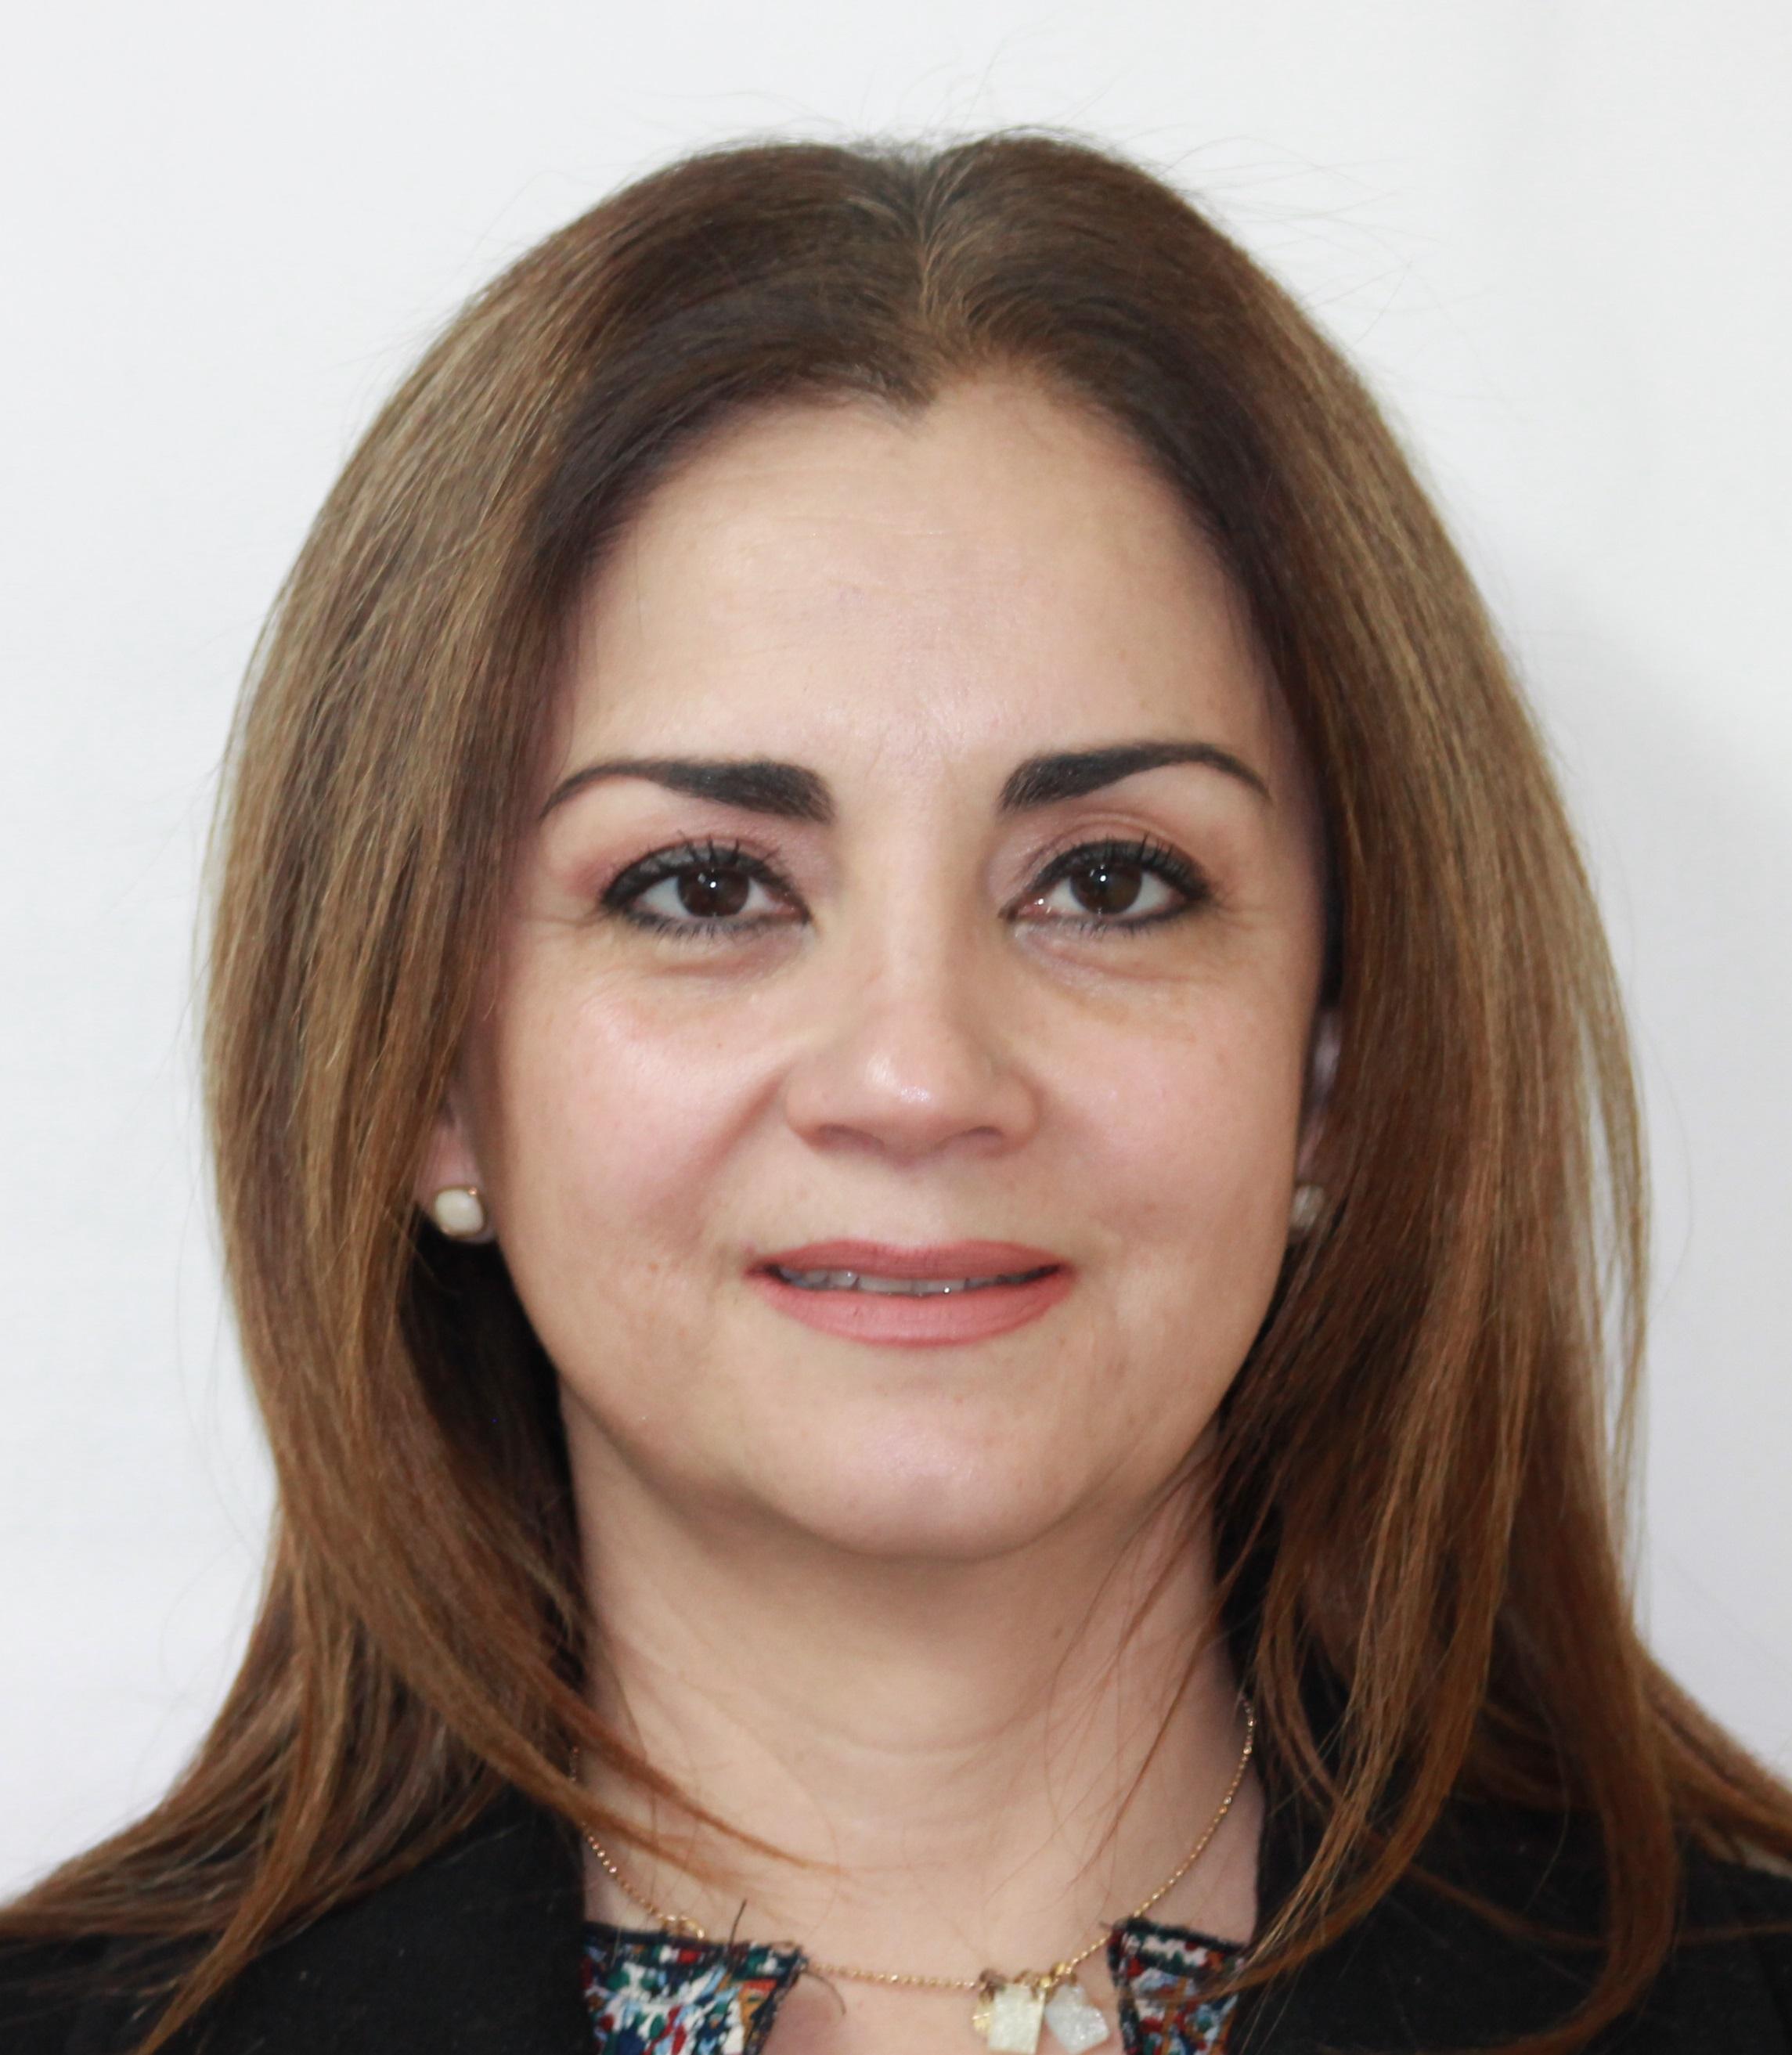 Erica Sanora 4398